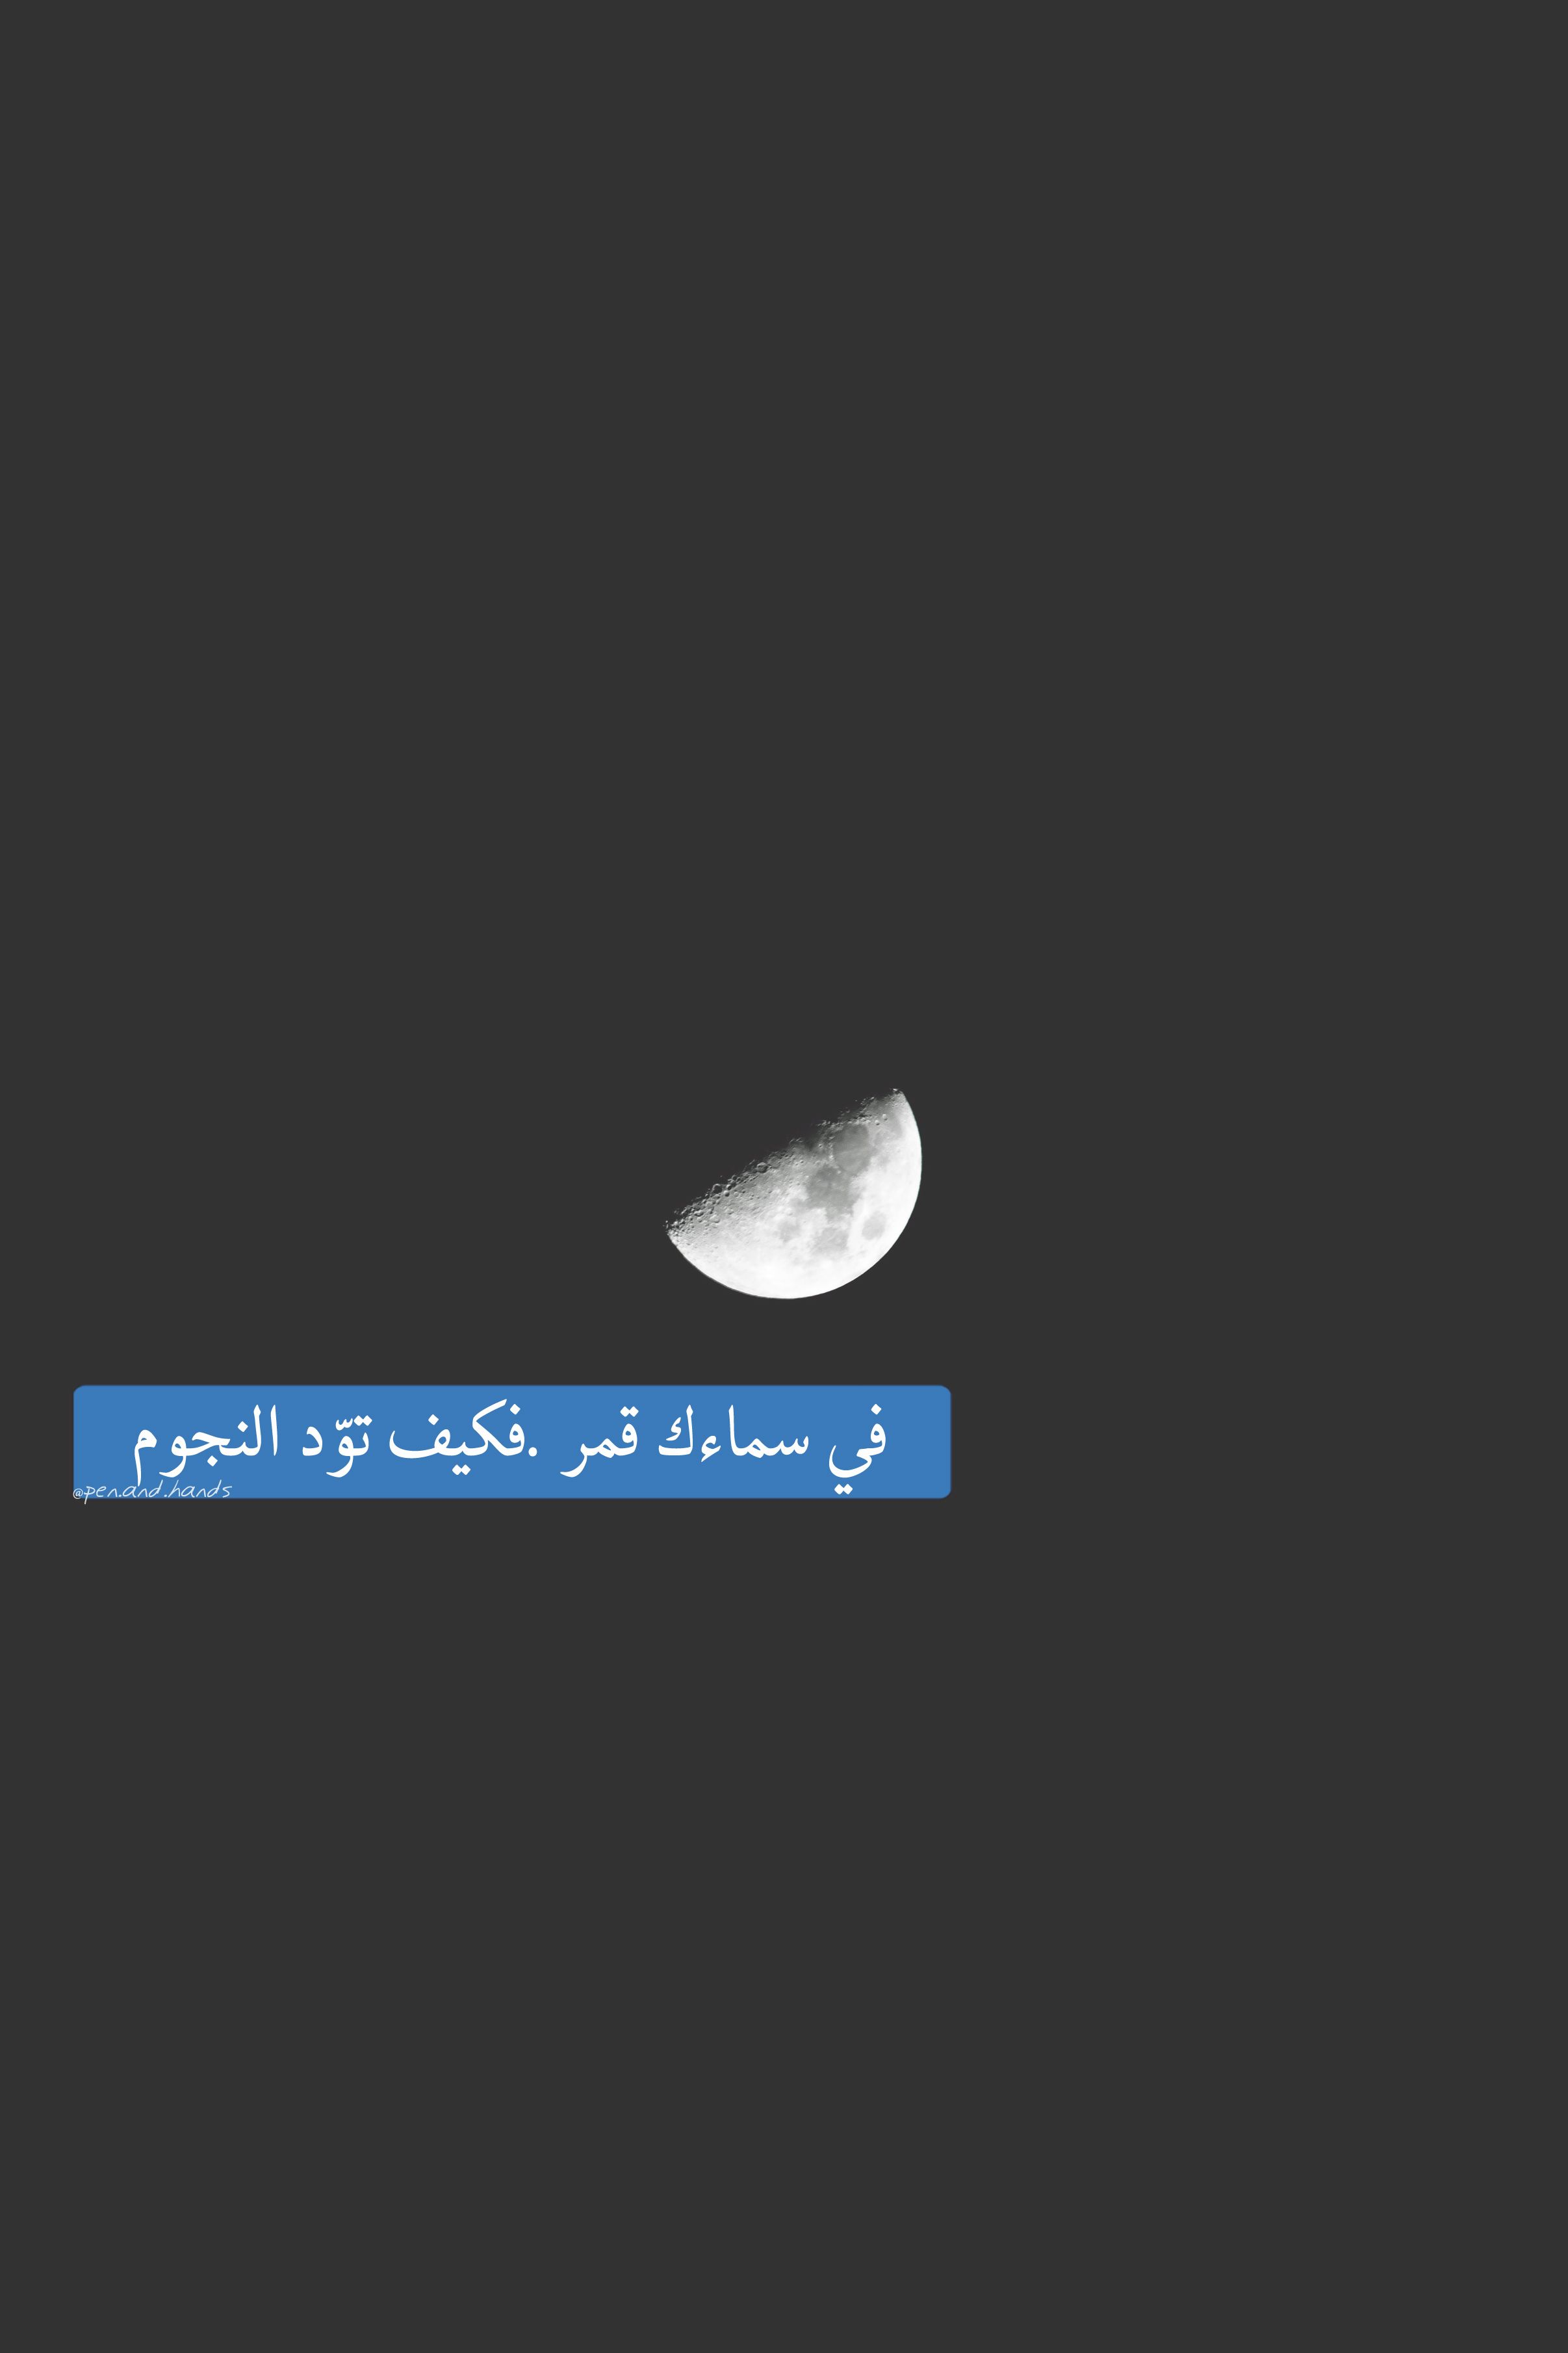 Mysterious Moon Moon Photography Beautiful Moon Night Sky Photography